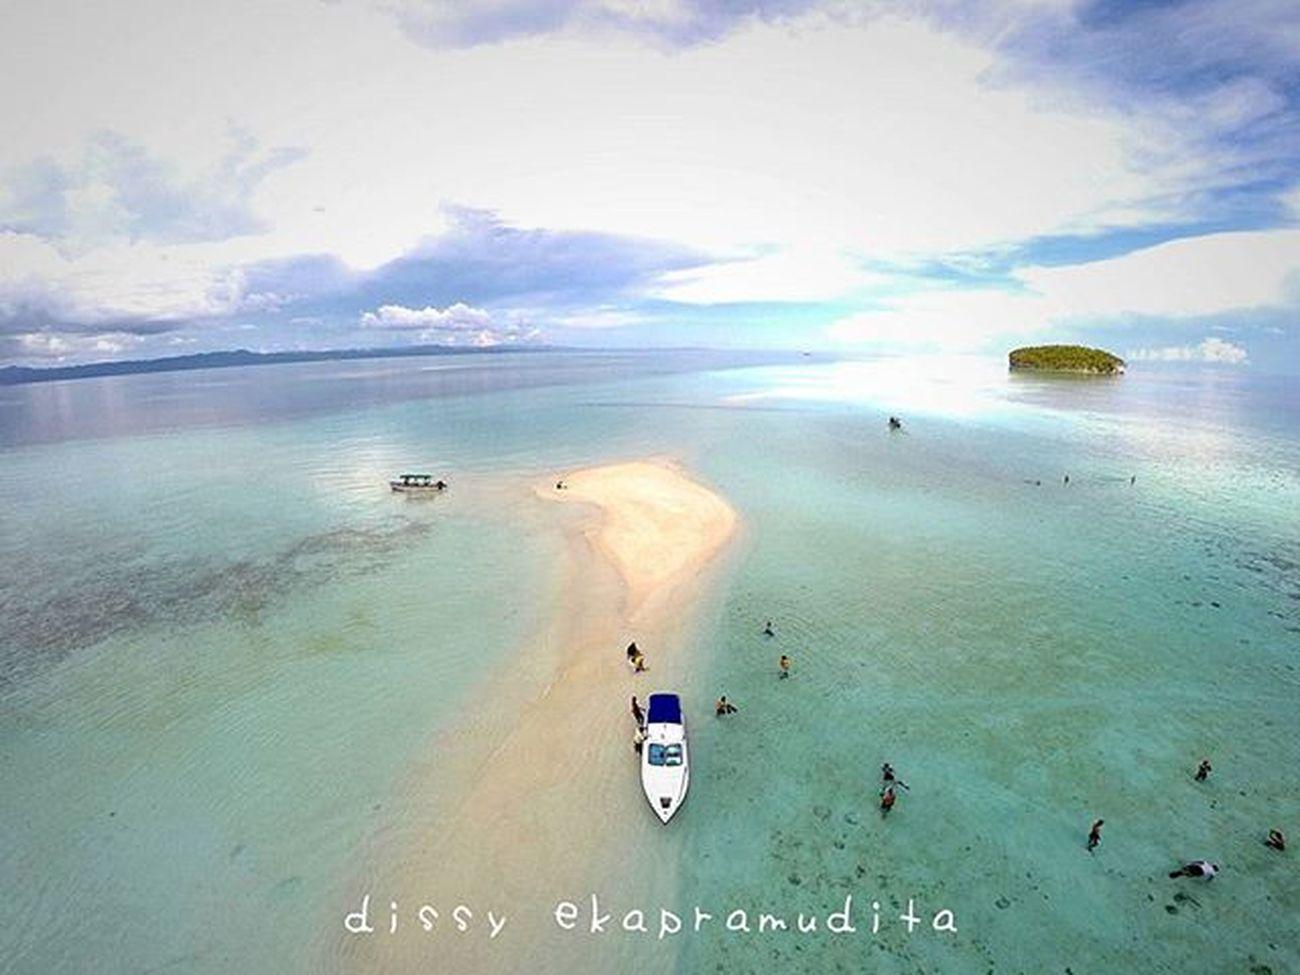 God must be smiling when creating raja ampat Rajaampat INDONESIA Papua 1000kata BeautifulIndonesia Indonesiaplayground Drone  Djiphantomindonesia Djiphantom Aerialphotography Instalike Instagram Instagood Instadaily Photooftheday Dronedaily Droneartwork